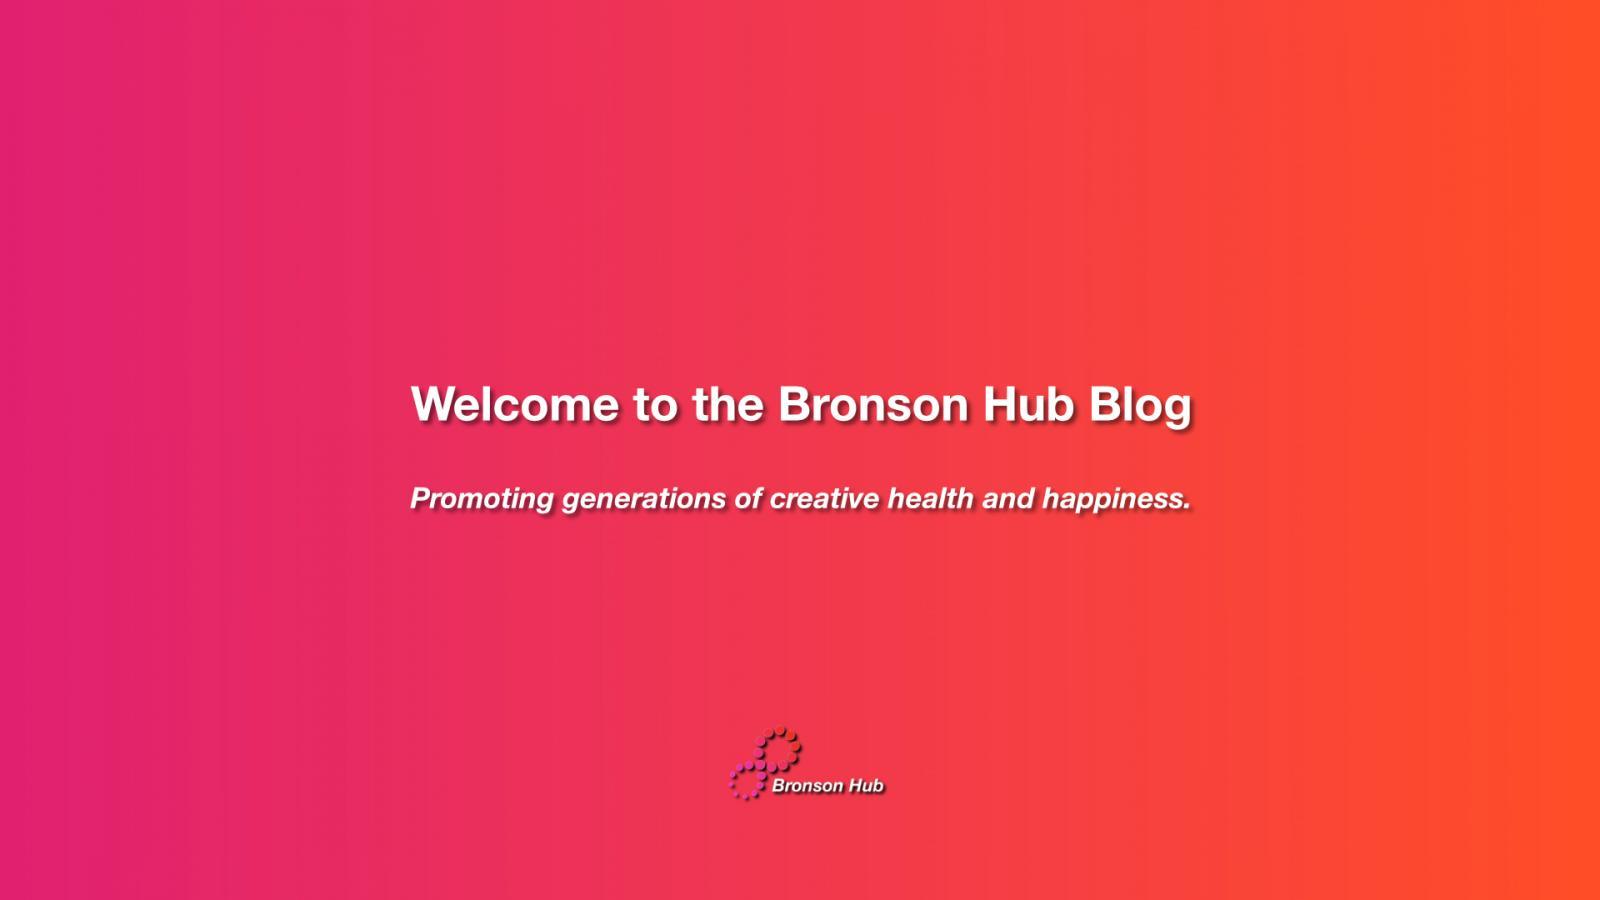 Bronson-centre-bronson-hub-blog